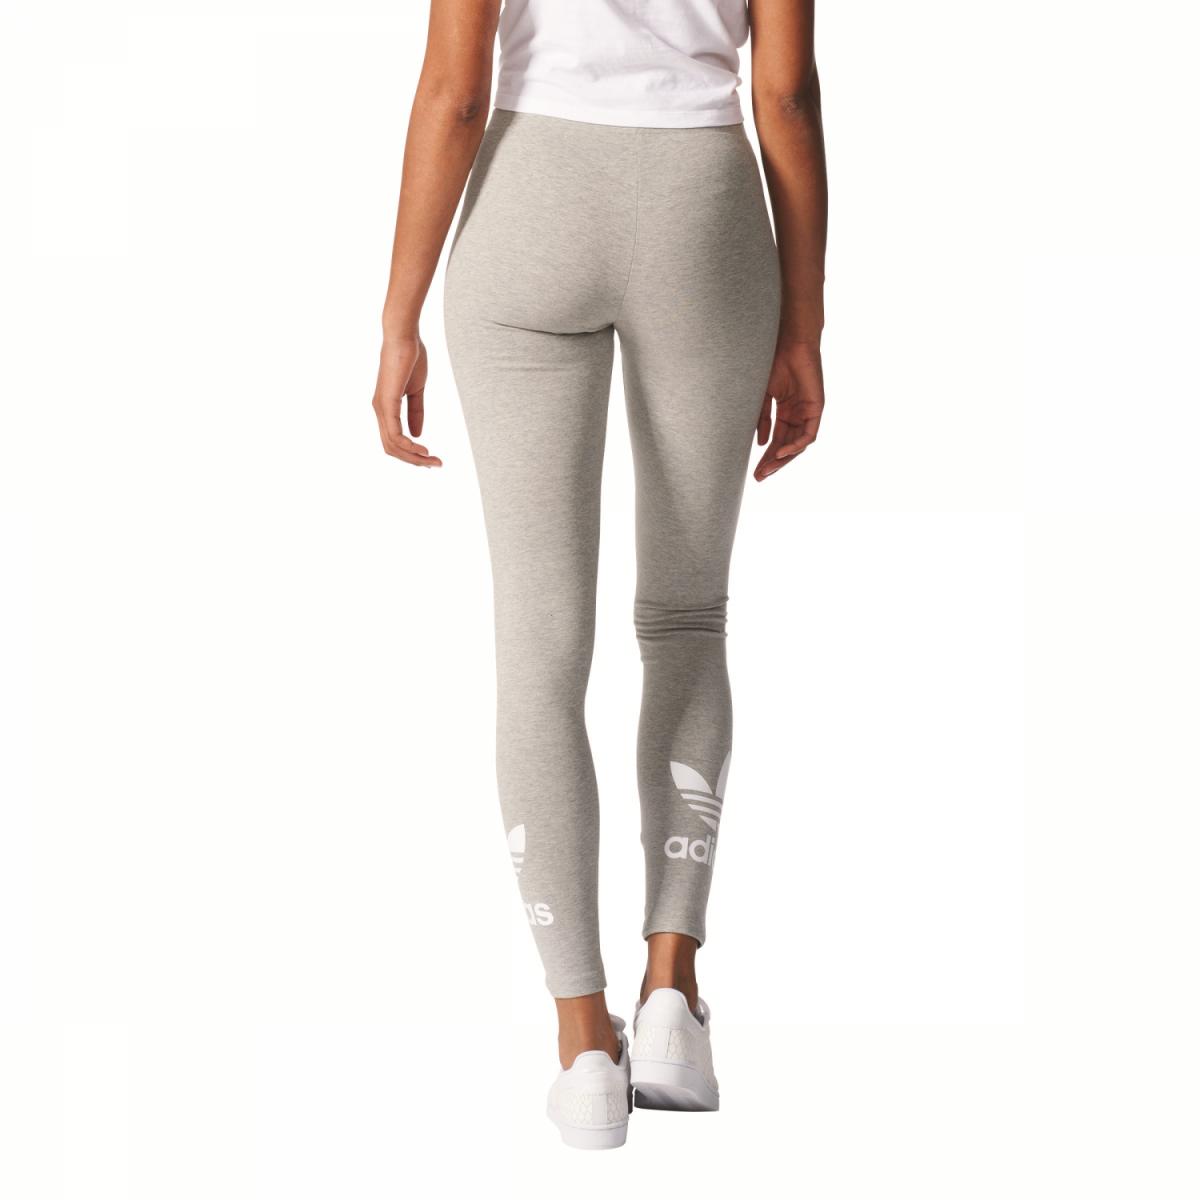 sport klingenmaier adidas originals trefoil leggings damen hose grau online kaufen. Black Bedroom Furniture Sets. Home Design Ideas